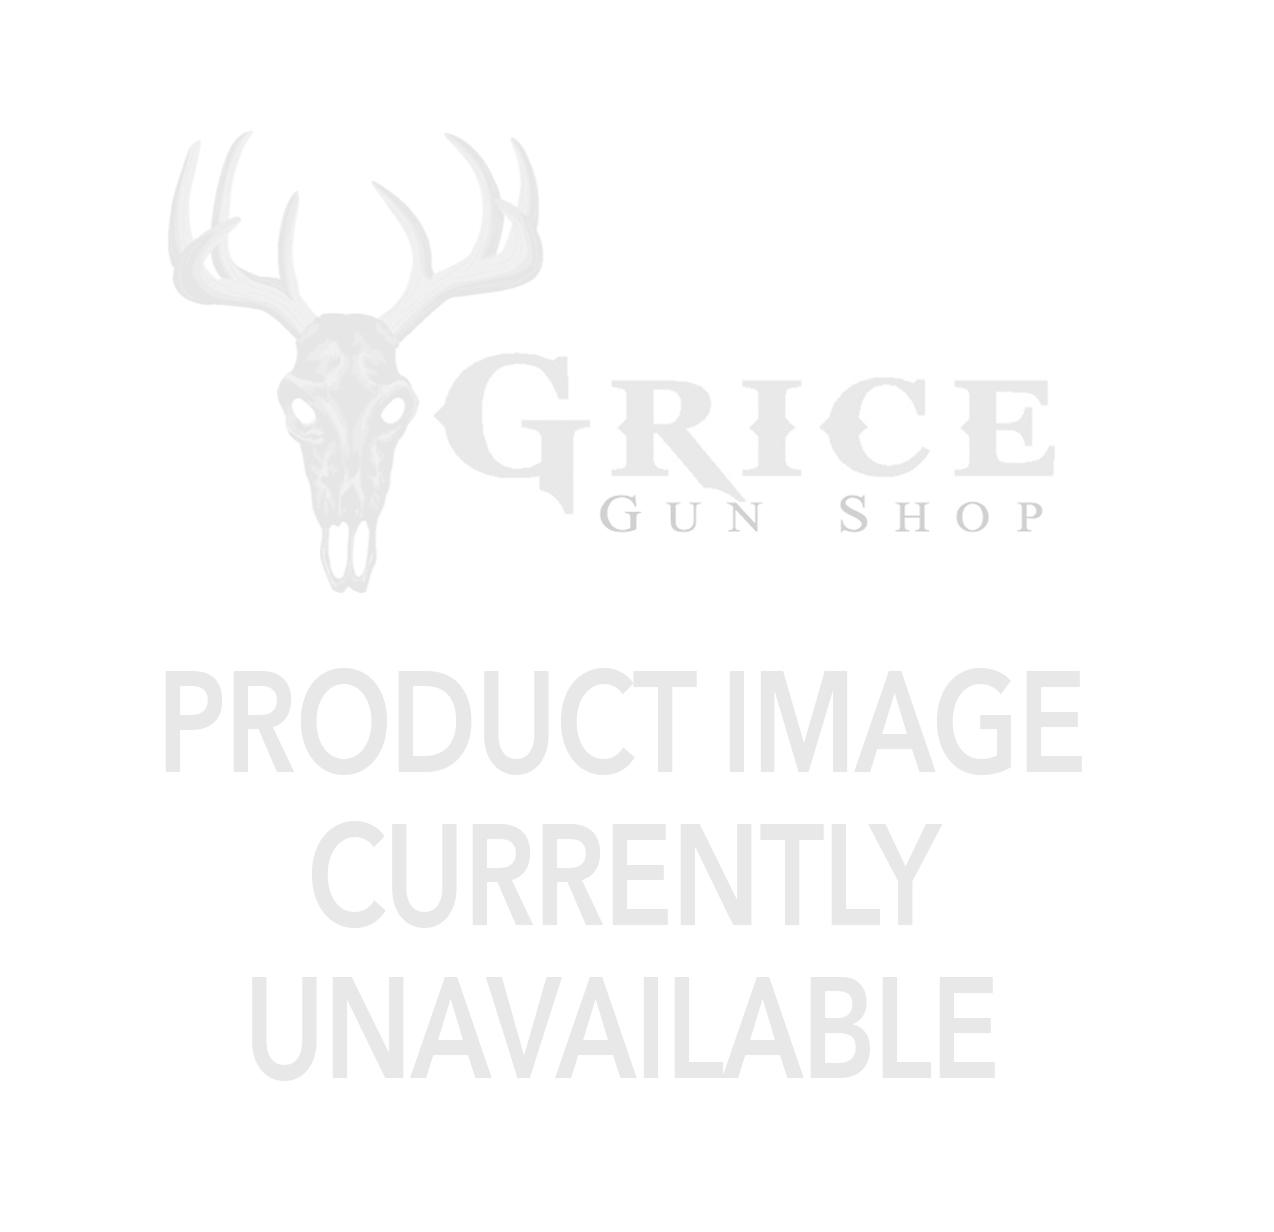 Grice Gun Shop - Pennsylvania's Largest Gun Shop